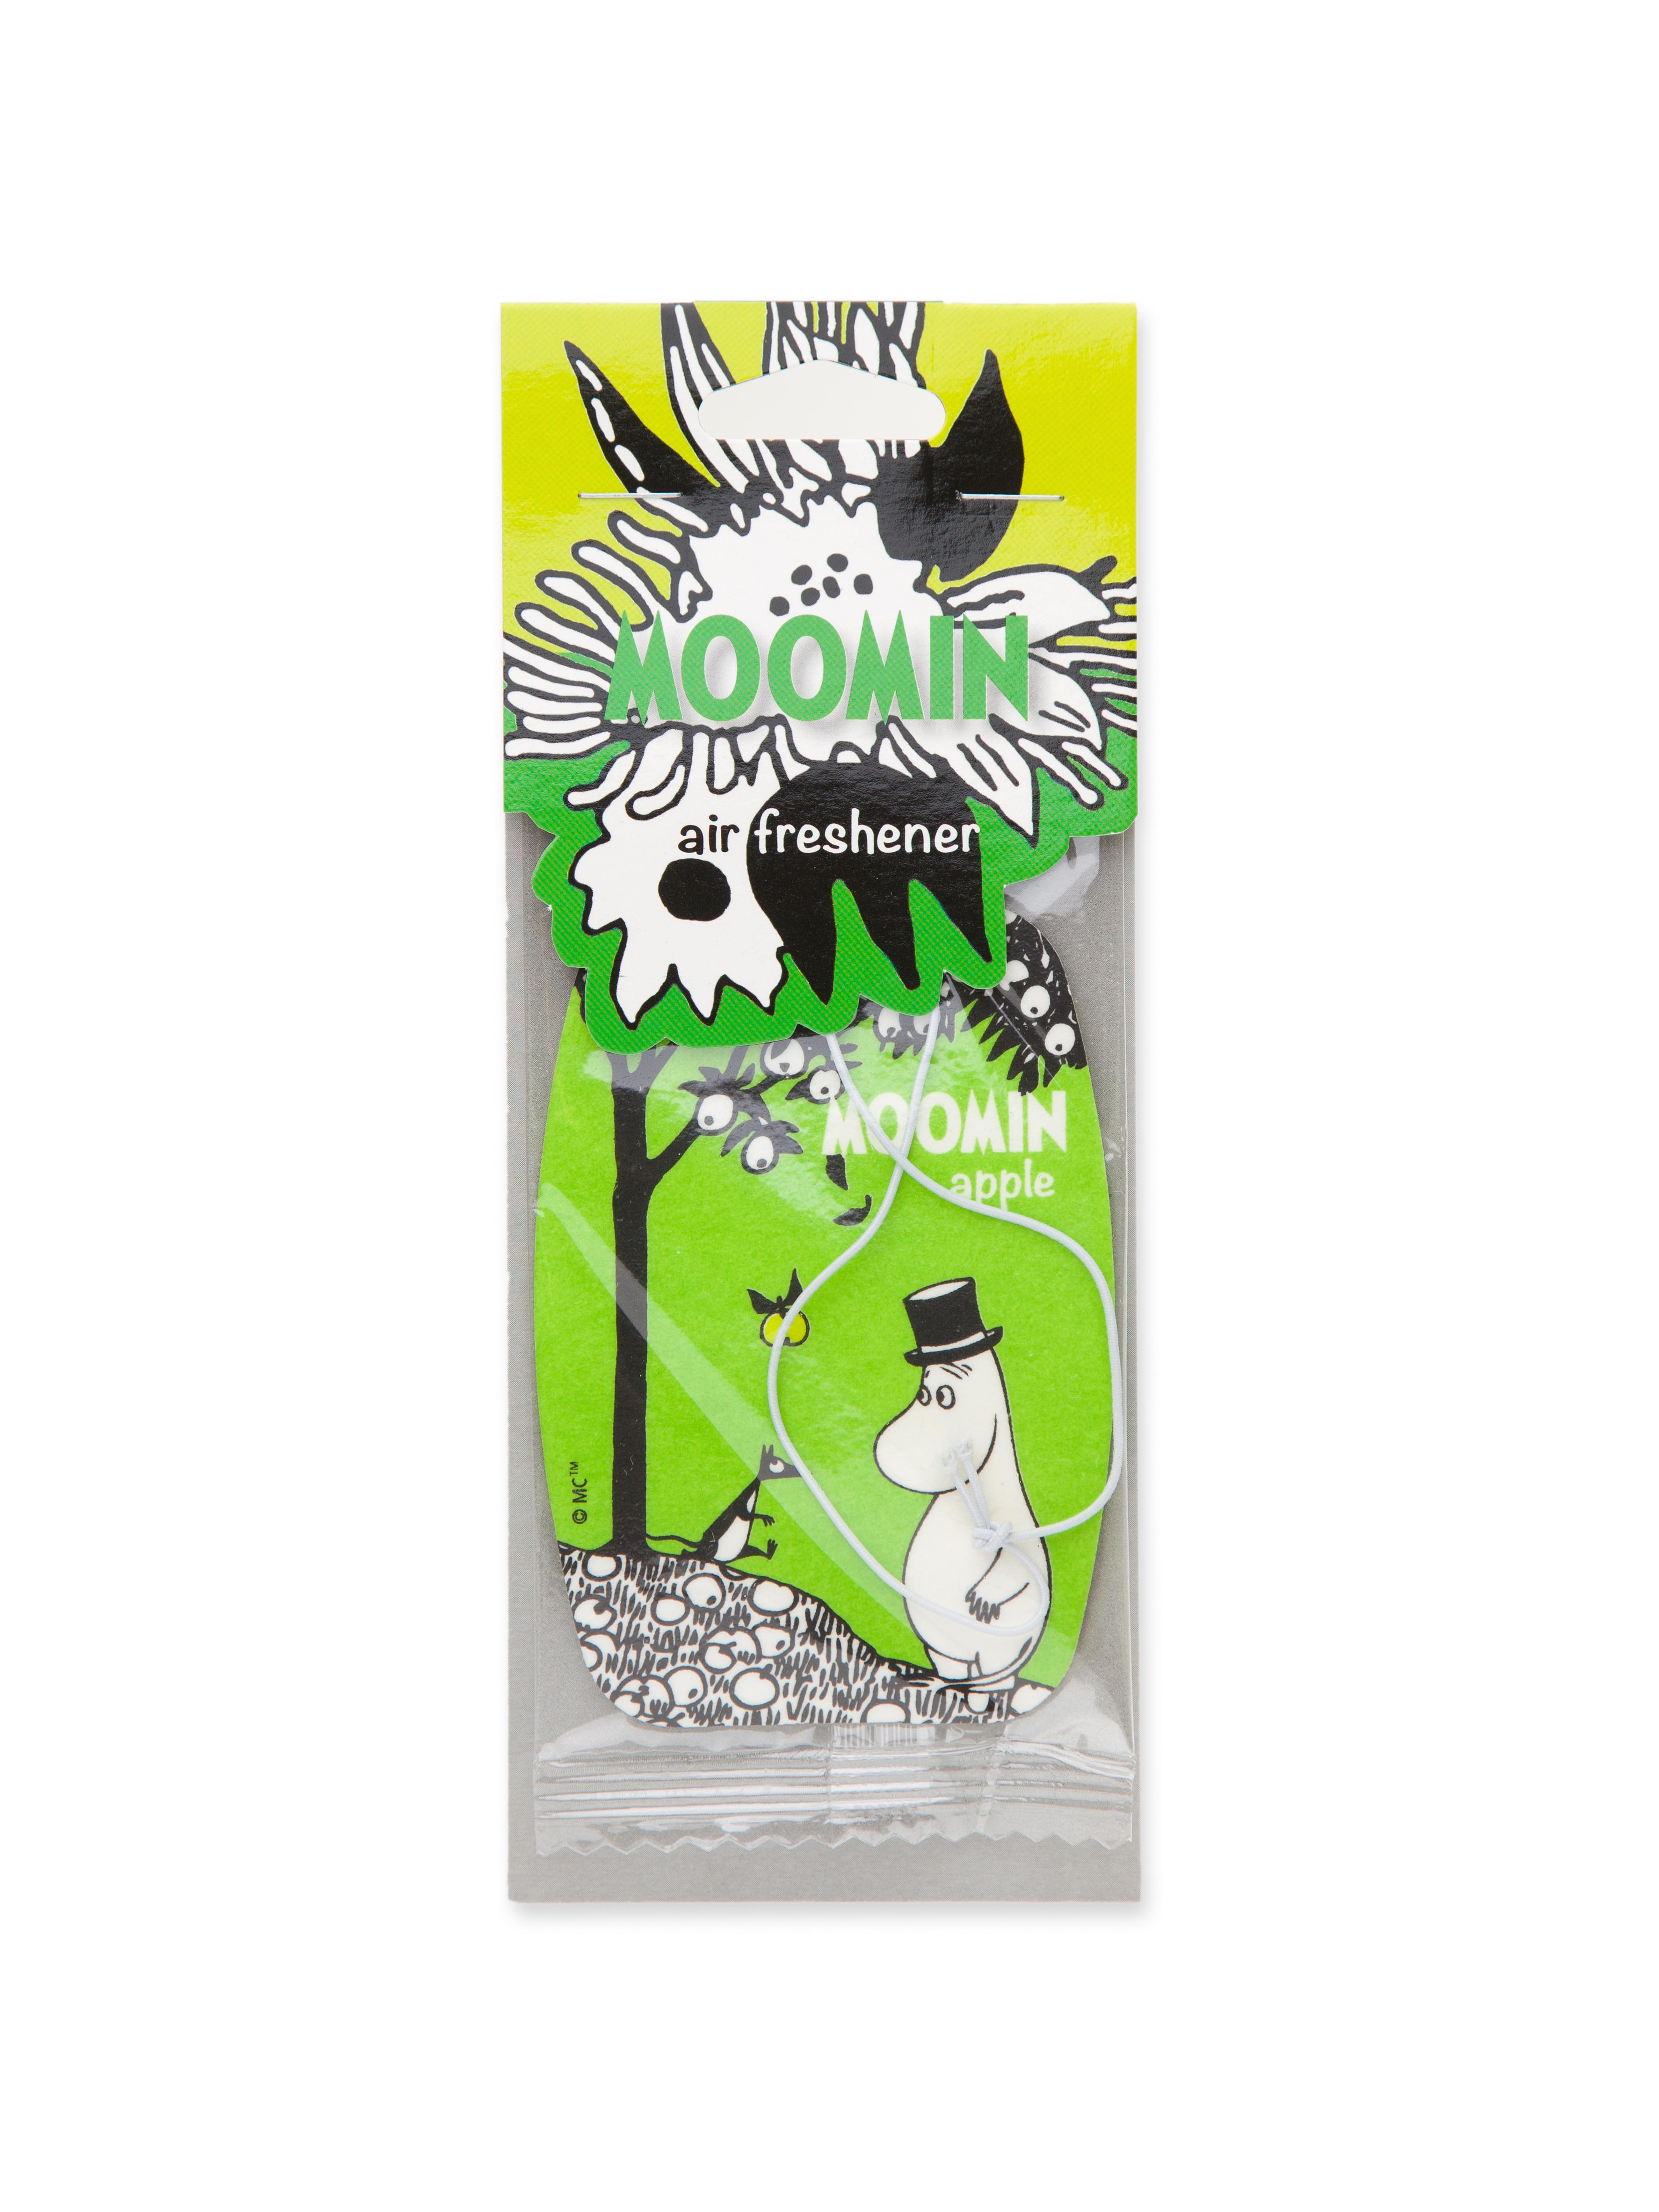 Aurora Decorari Moomin Air Freshener 156FLM Moominpappa Apple